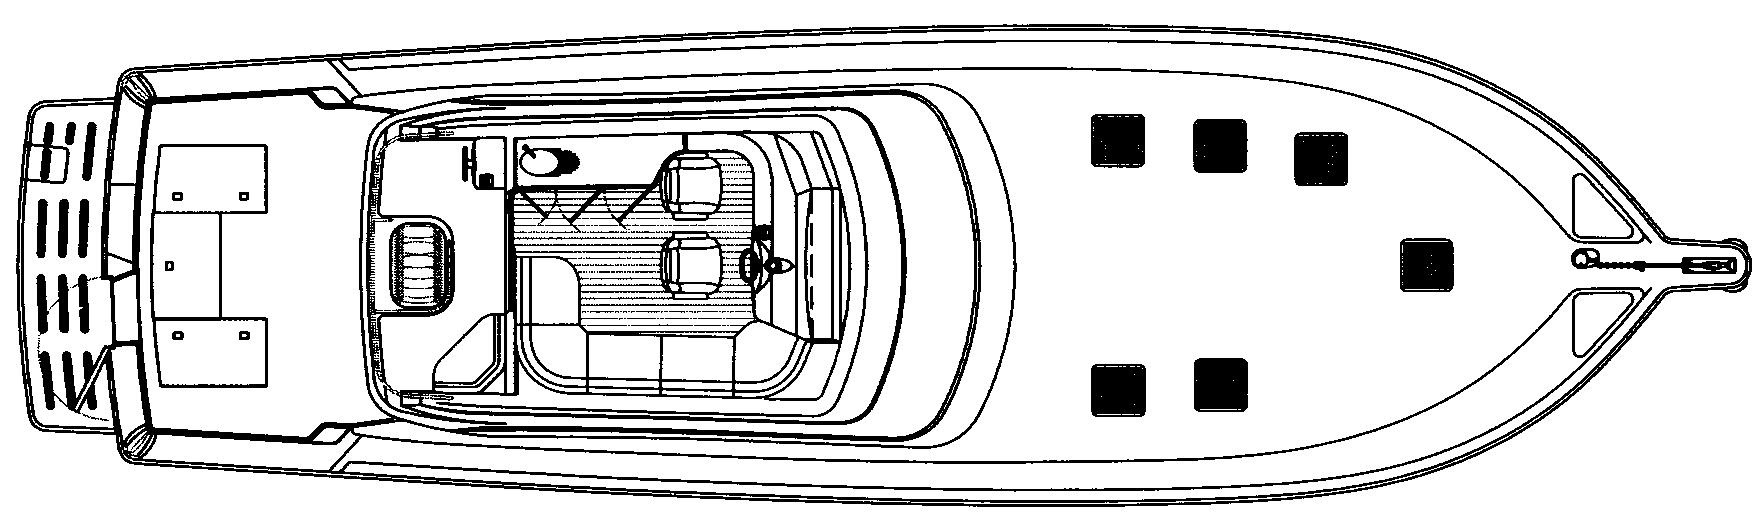 58 Enclosed Bridge Floor Plan 2